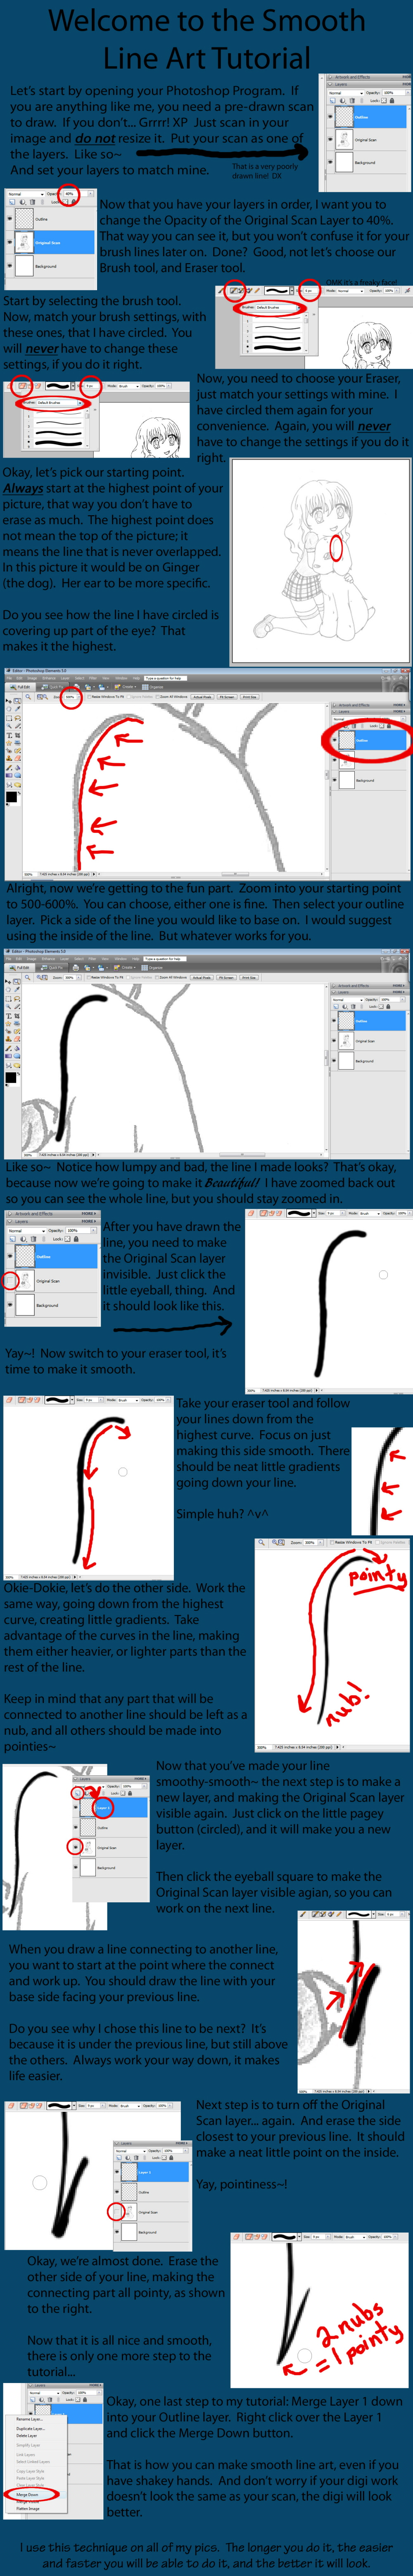 Digital Drawing Smooth Lines : Smooth line art tutorial by s r n y on deviantart